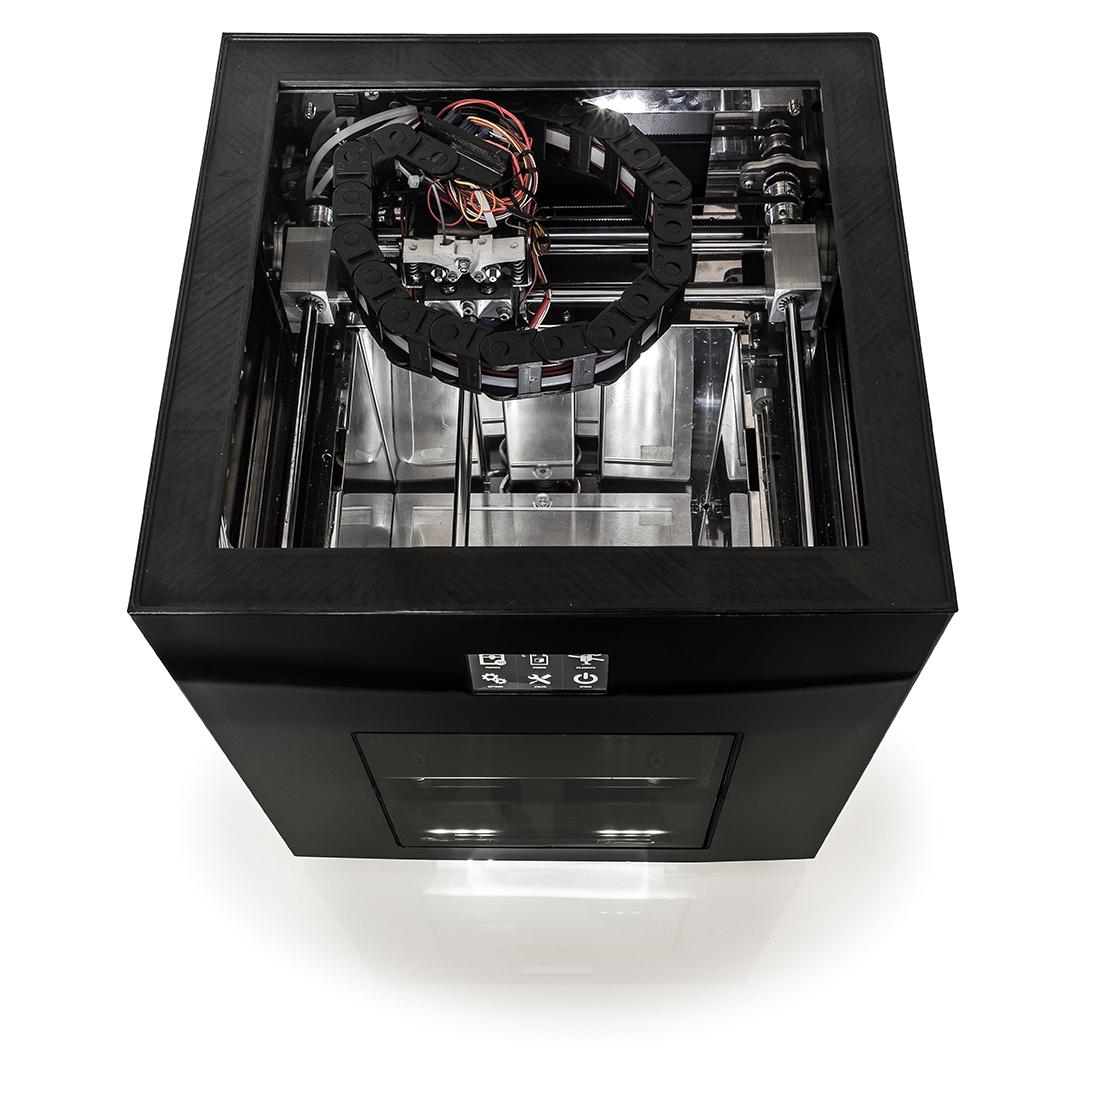 Tred Q_be black desktop 3D printer